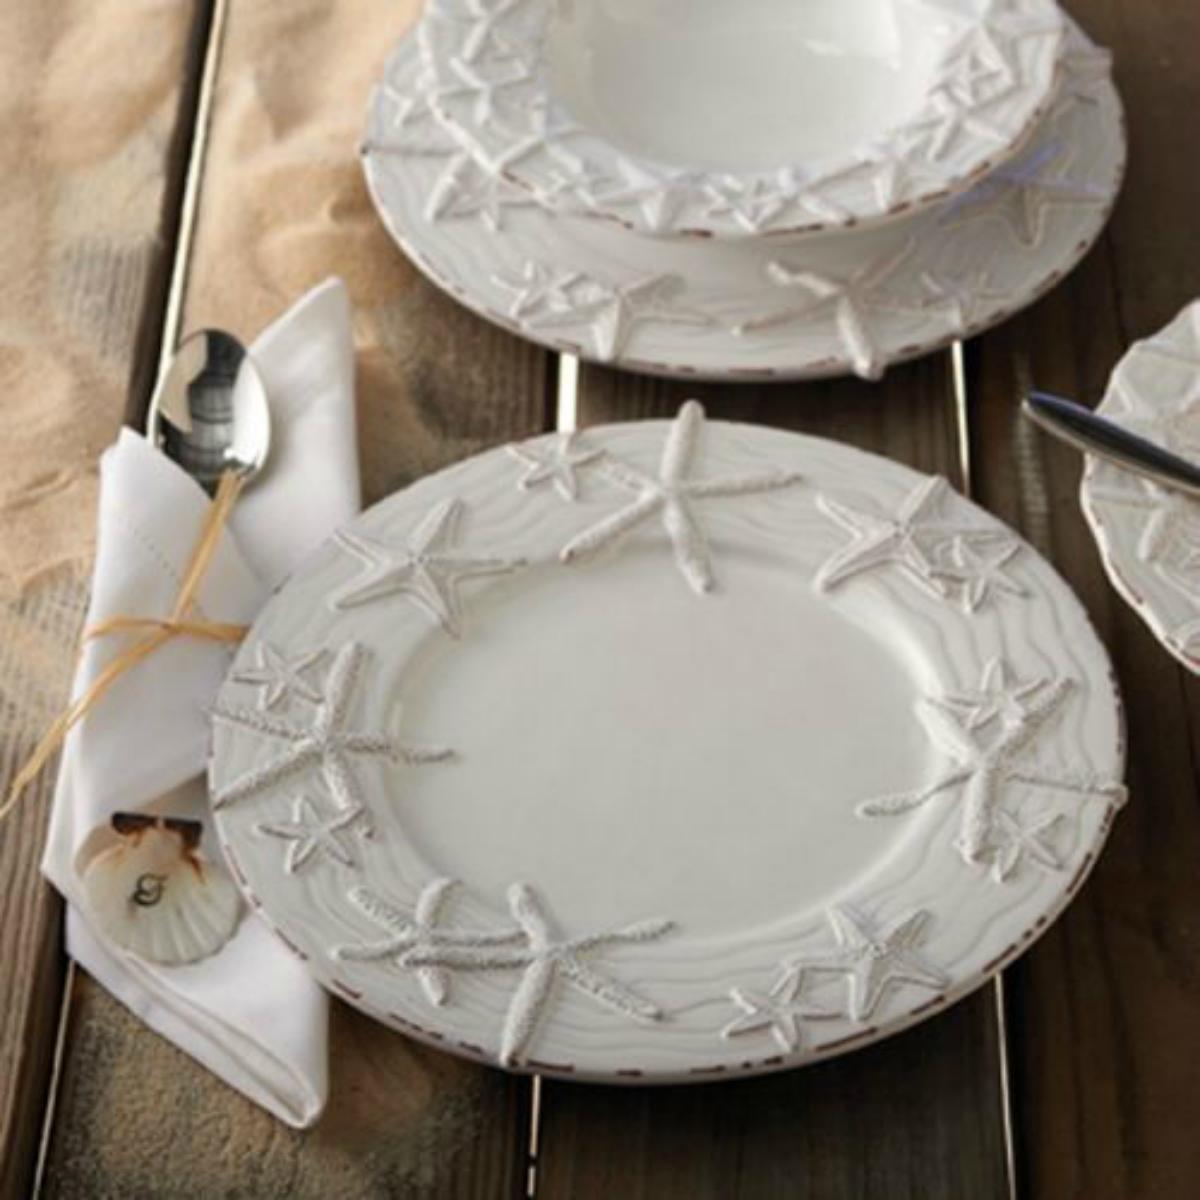 Star Fish Dinner Plates set of 4 & Star Fish Dinner Plates set of 4 | Party night platters | Pinterest ...